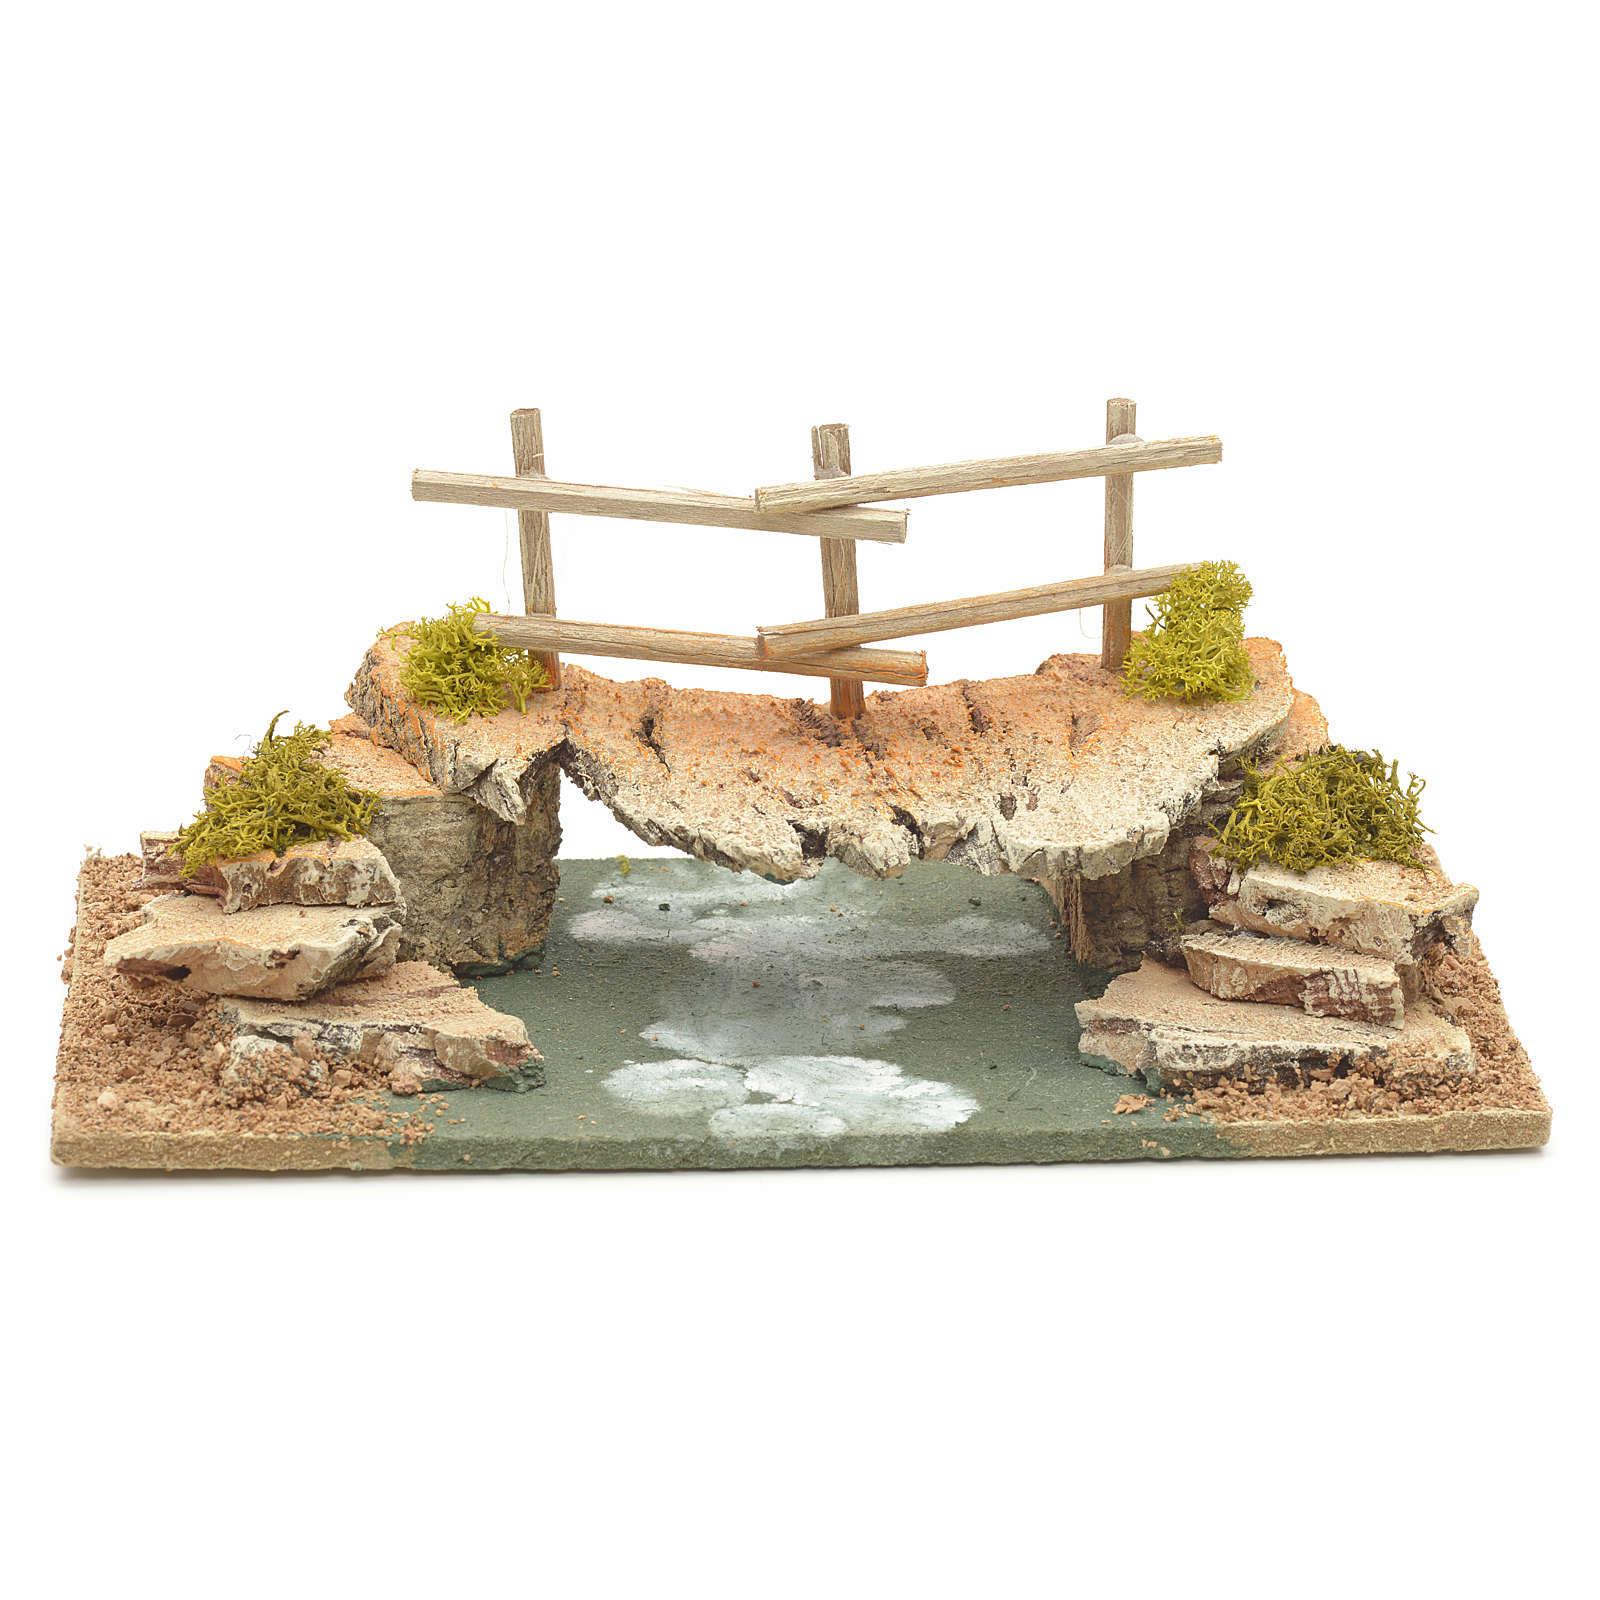 Nativity setting, cork bridge 10x20x10cm 4